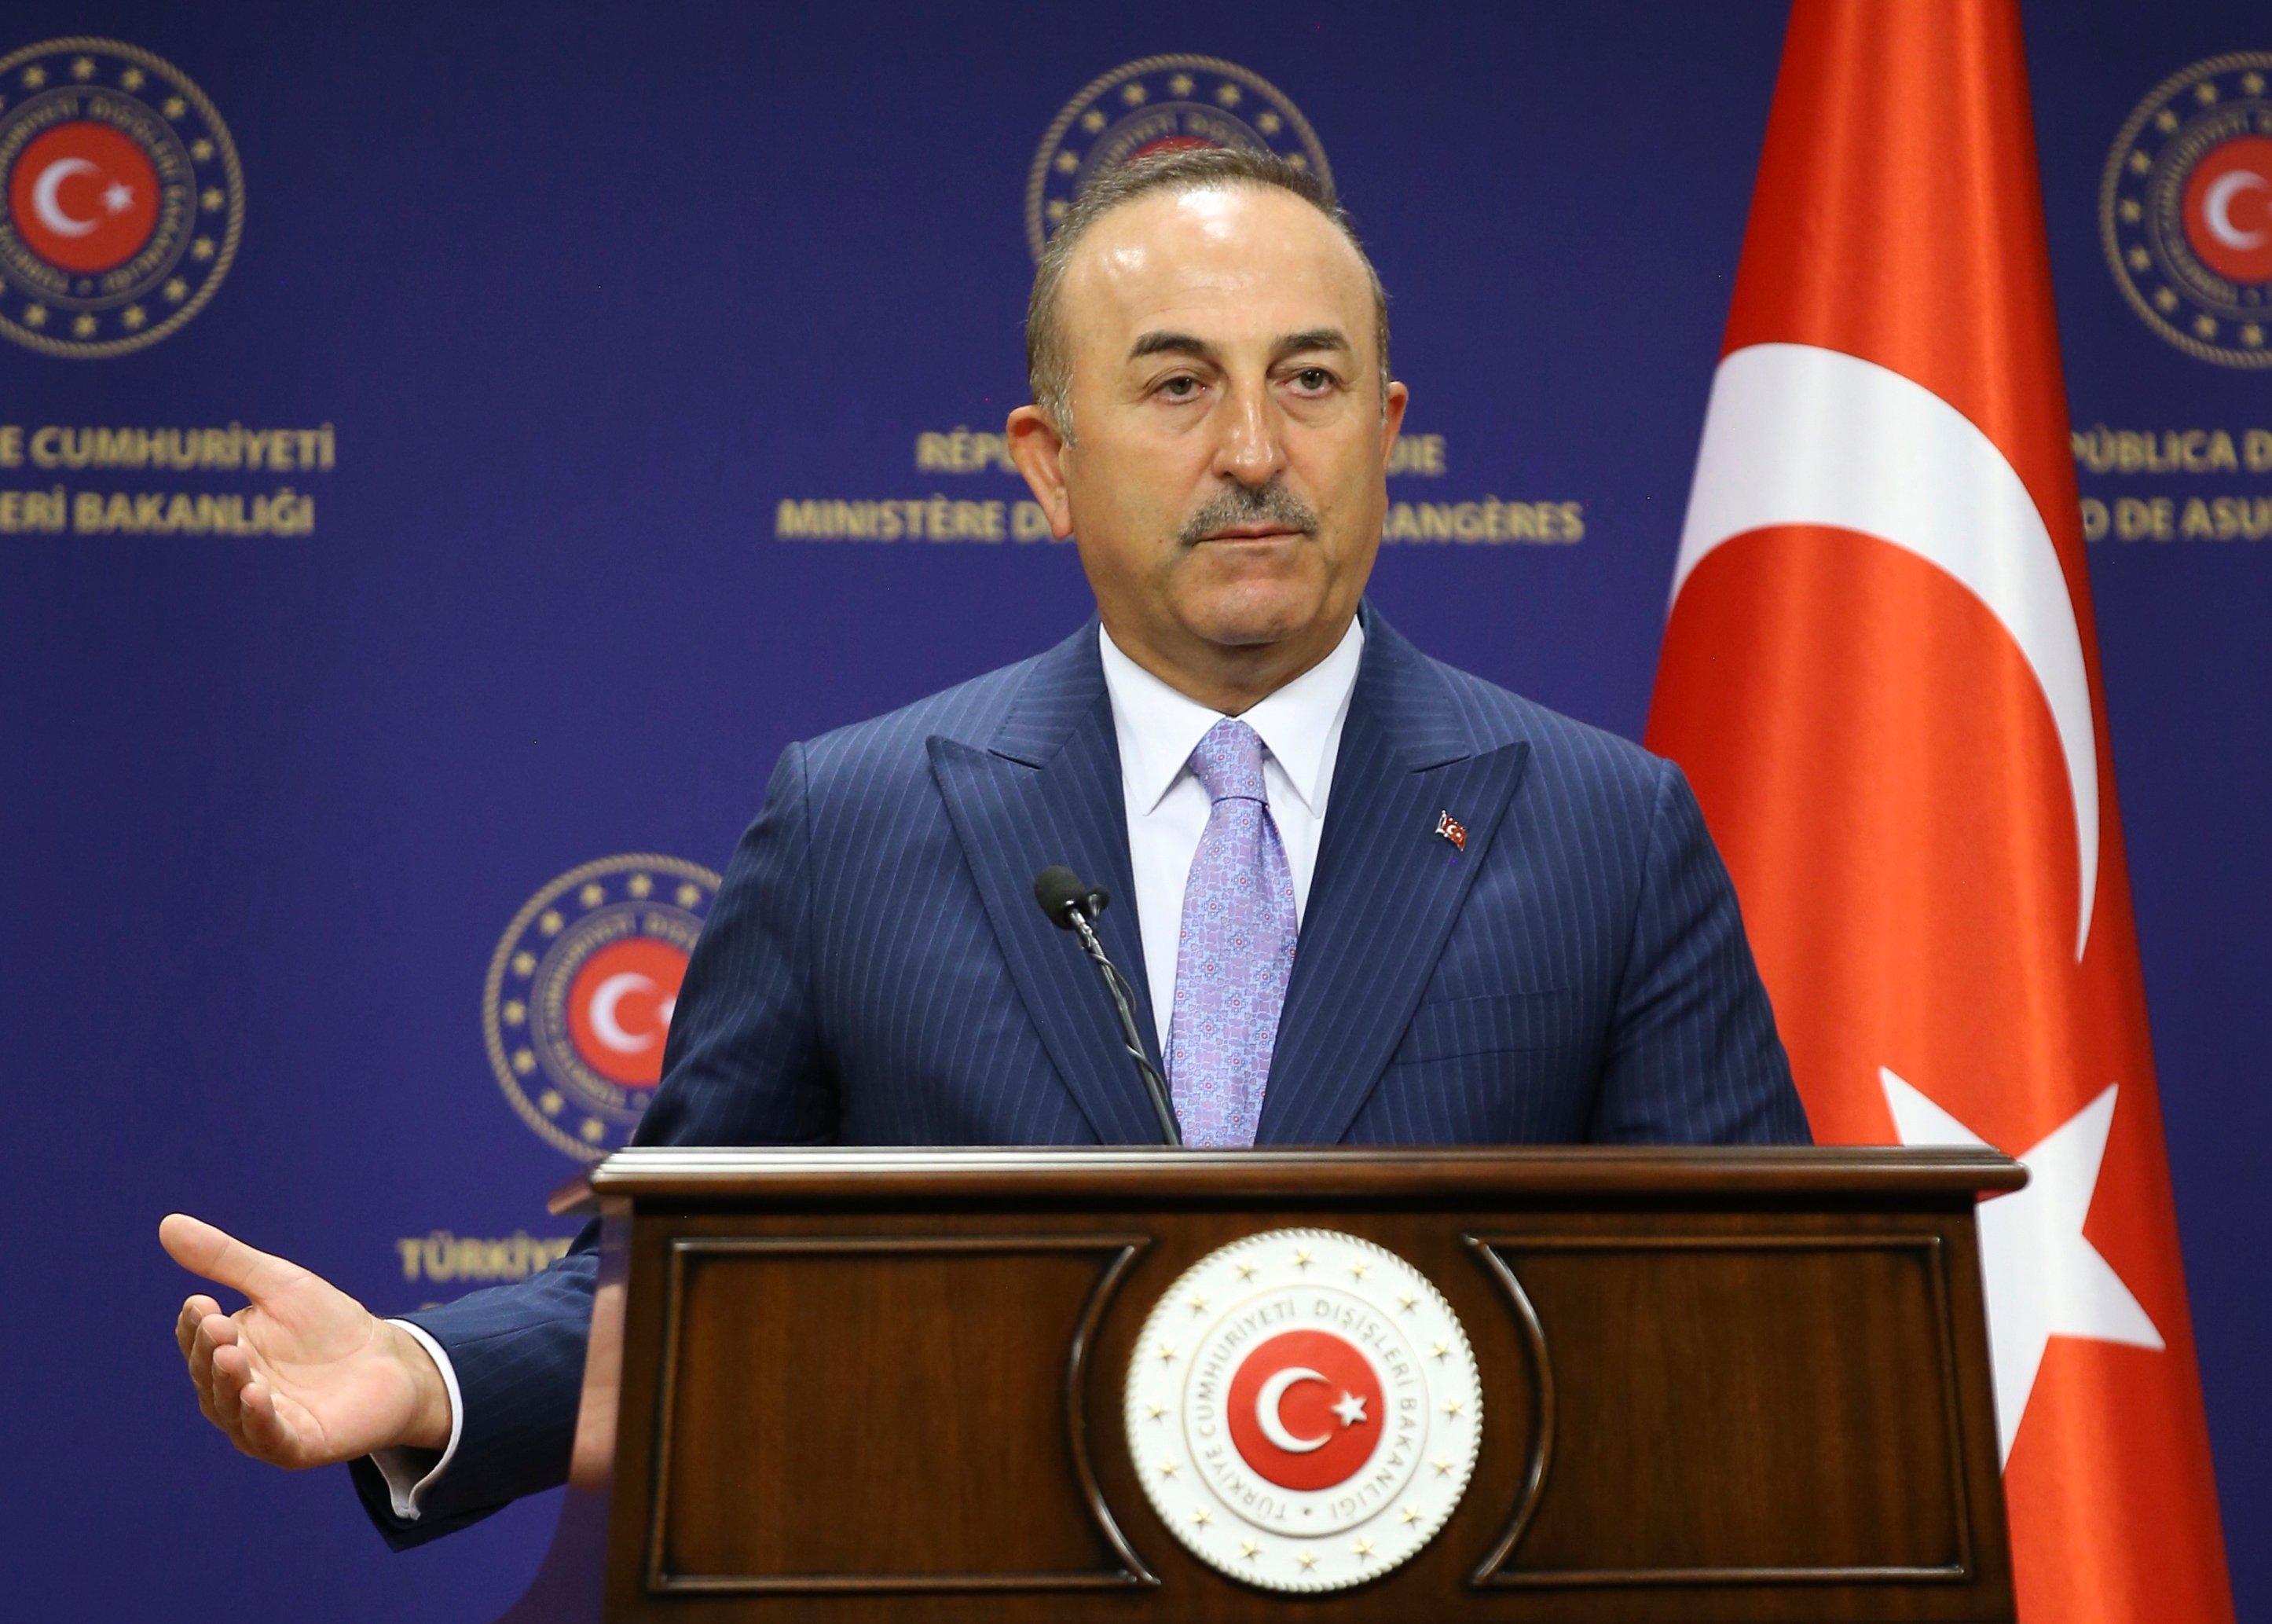 NATO ally France working to ramp up Russian presence in Libya: FM Çavuşoğlu | Daily Sabah